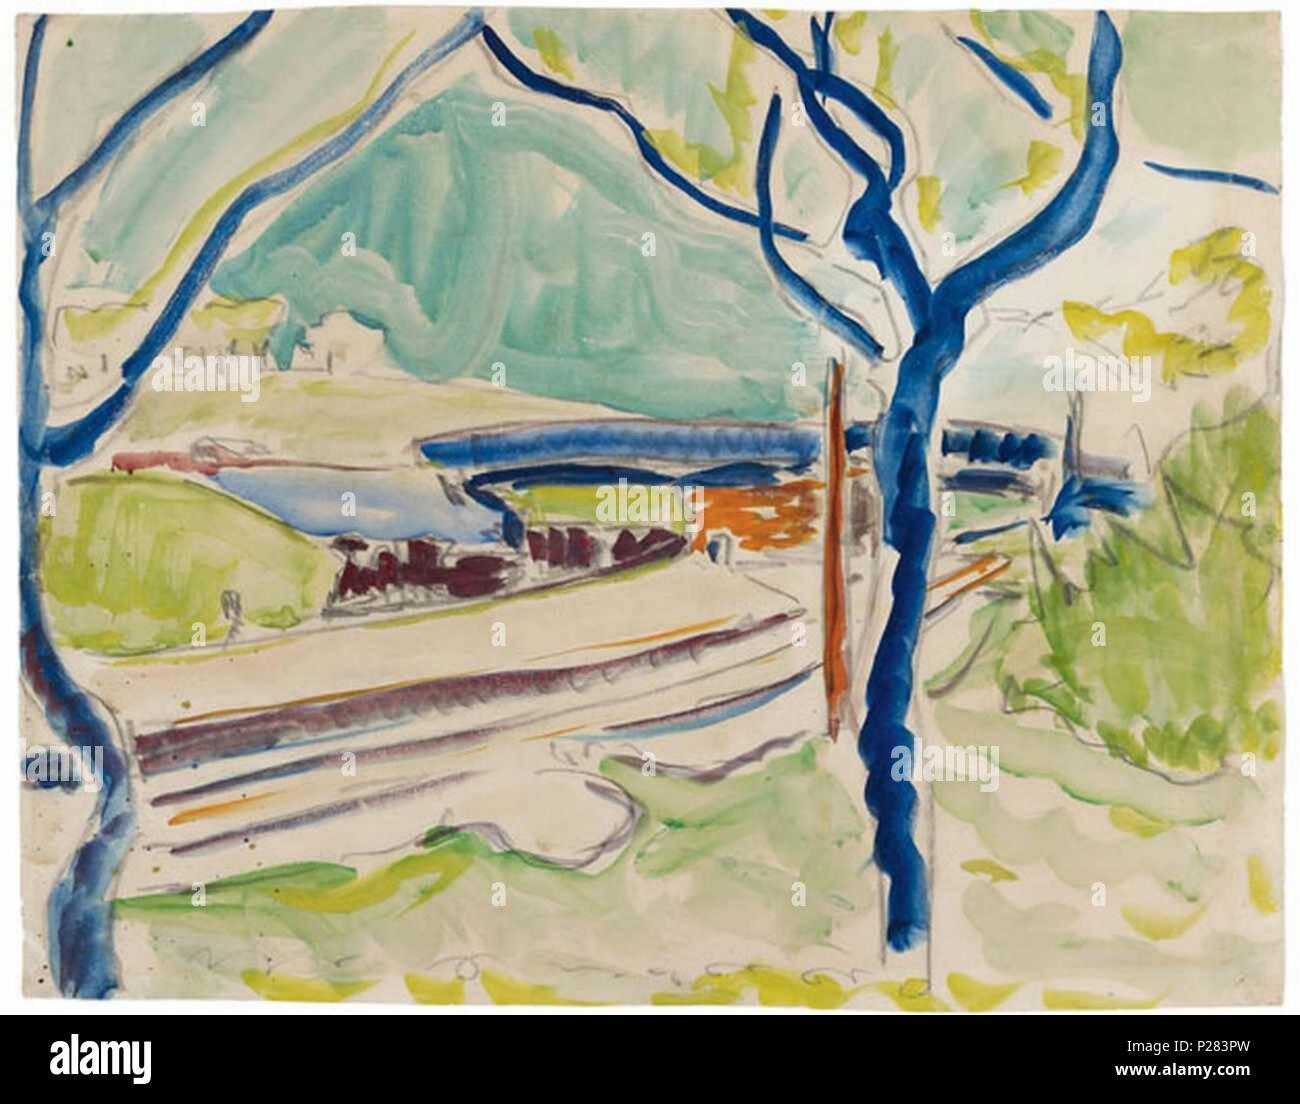 Ernst Ludwig Kirchner Poster Glasbild Landschaft Sertigtal Leinwandbild